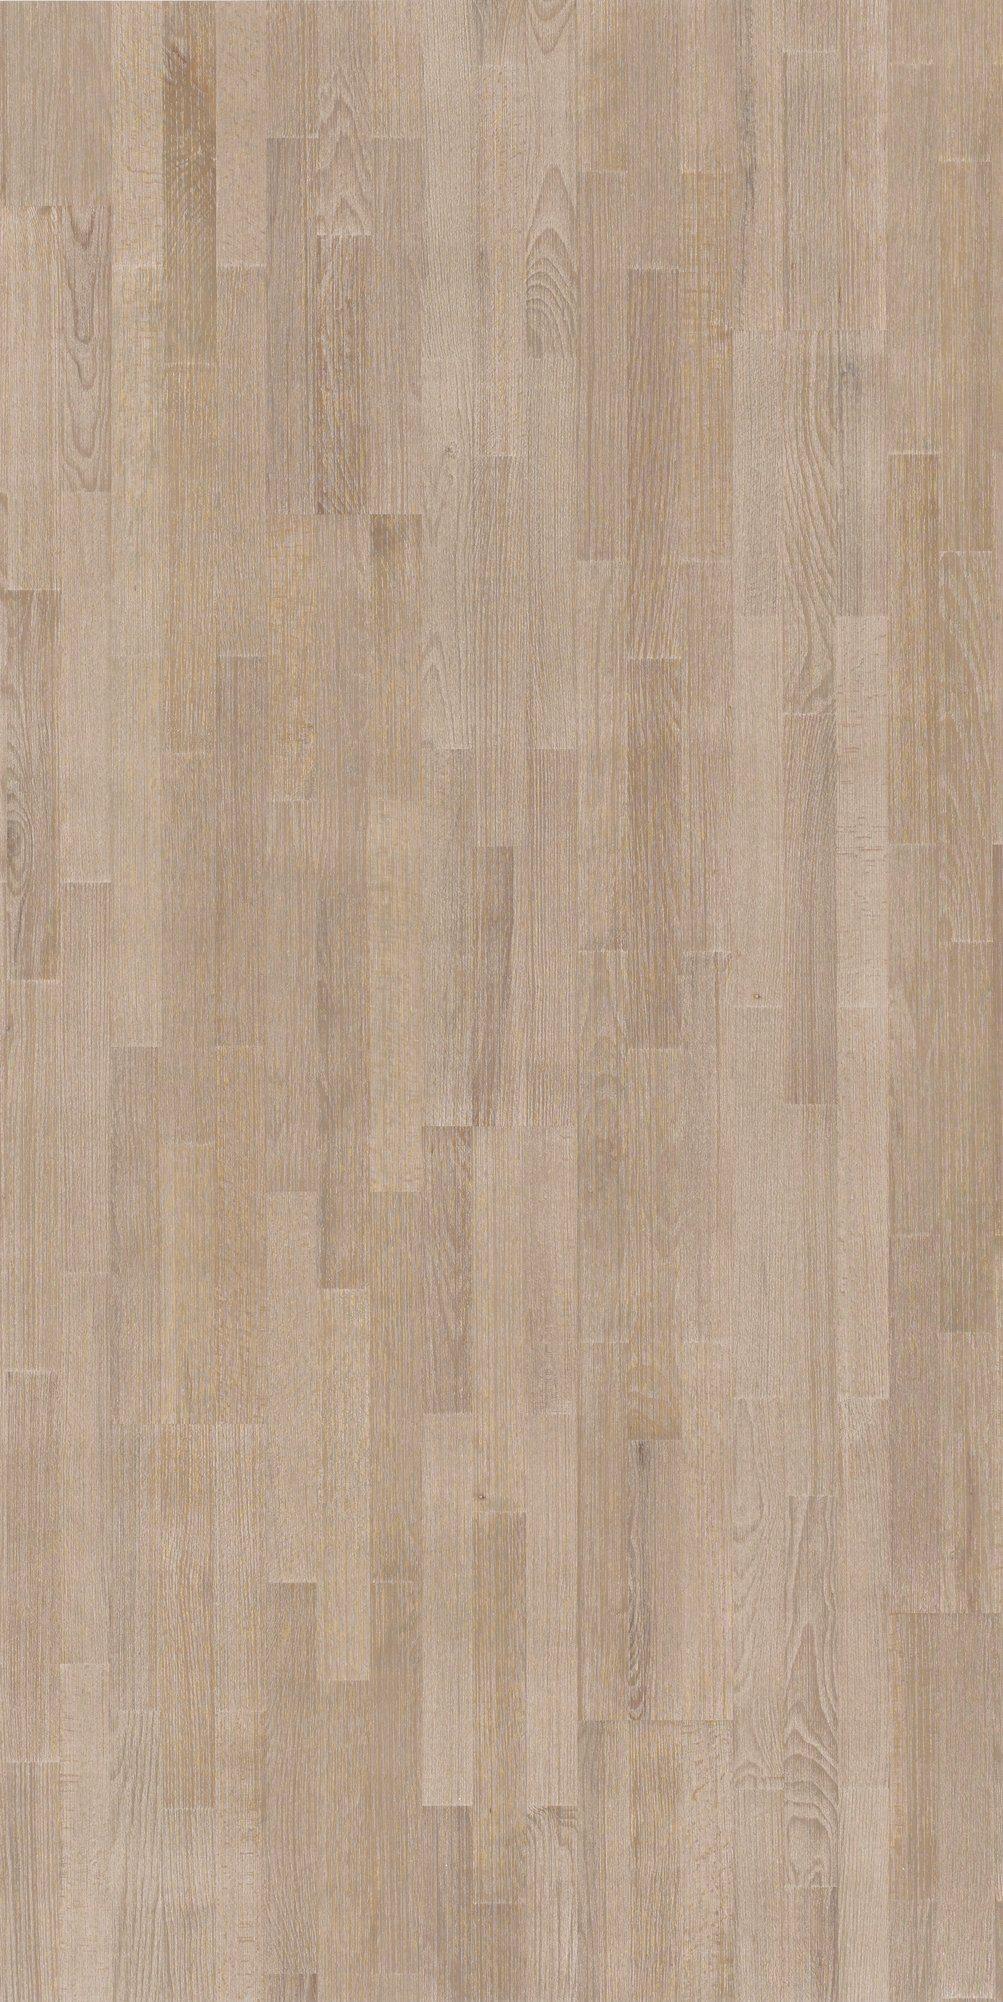 PARADOR Parkett »Classic 3060 Living - Buche MontBlanc«, 2200 x 185 mm, Stärke: 13 mm, 3,66 m²